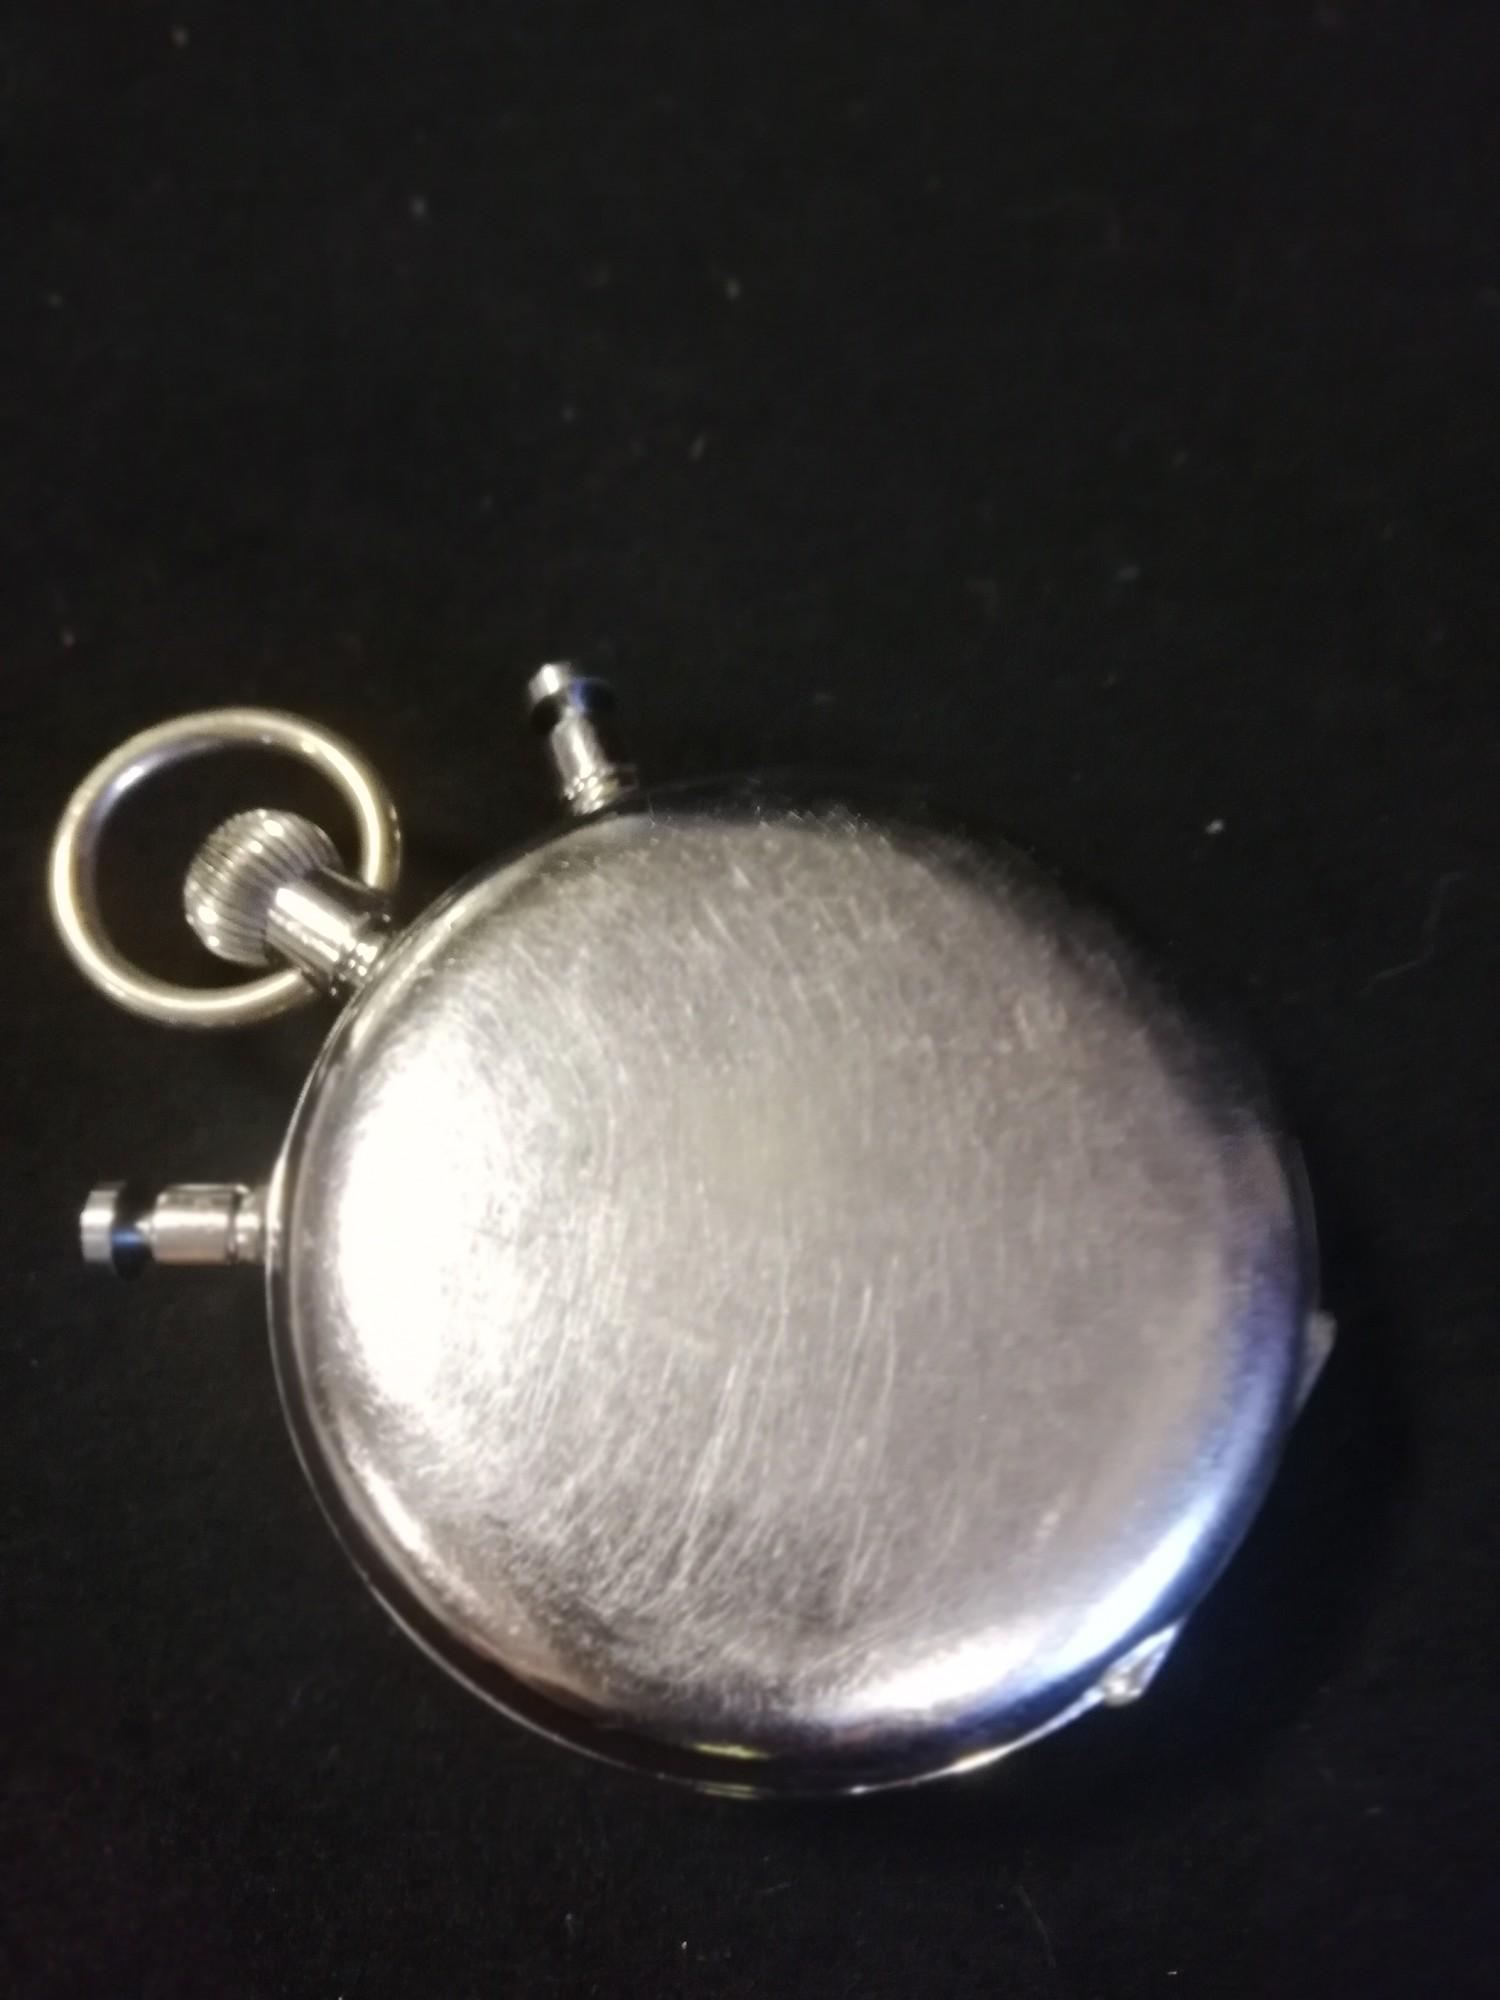 Omega split second stopwatch in chrome case - Image 2 of 2